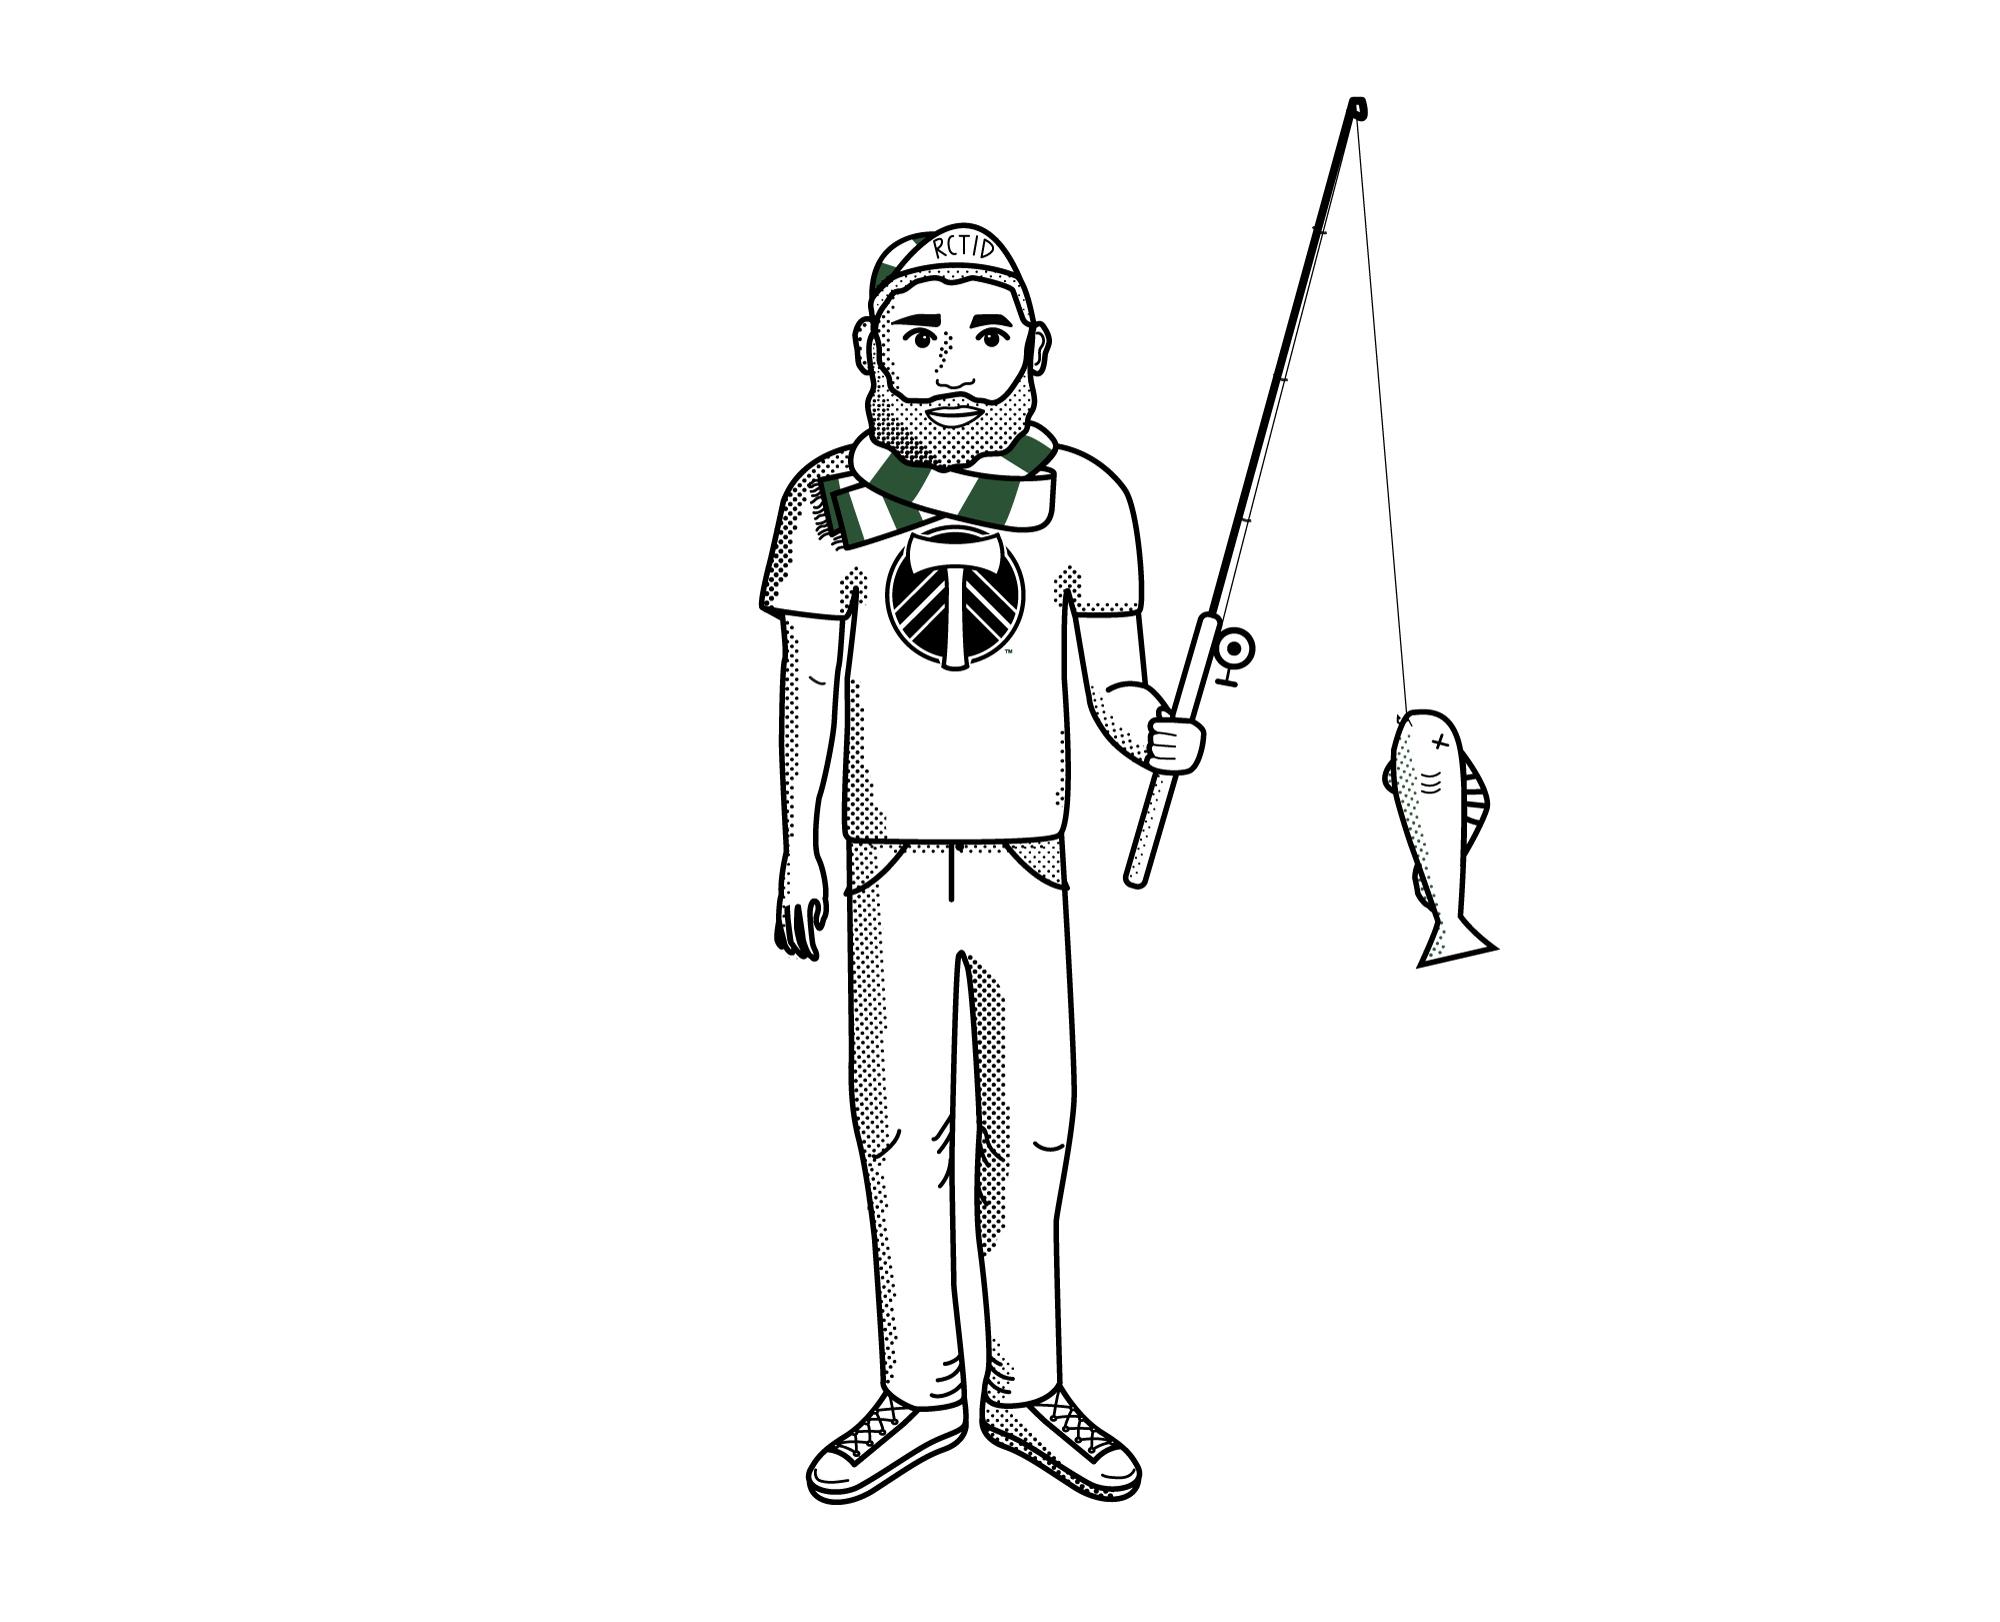 fisherman_v1.4.jpg